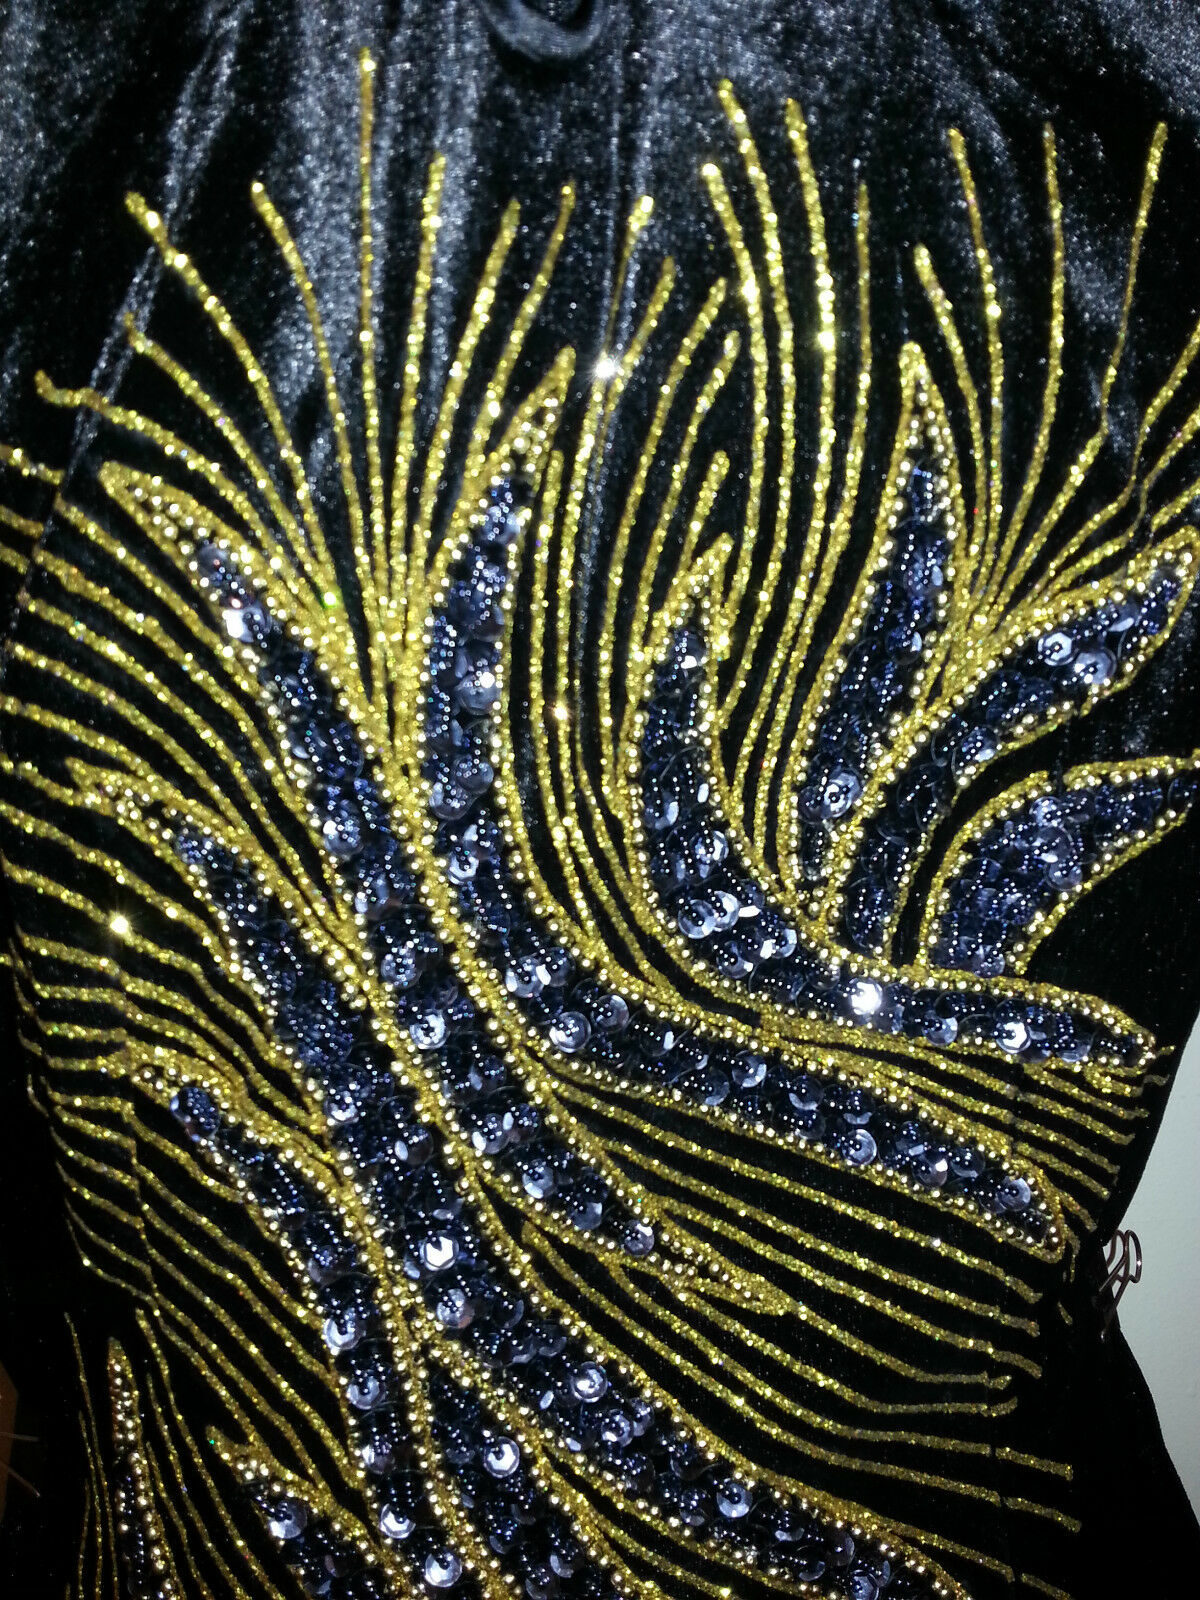 SALE  Größe 10 (M) (MN-BK) New Evening Dress Long Dress Party Gown With Sequins